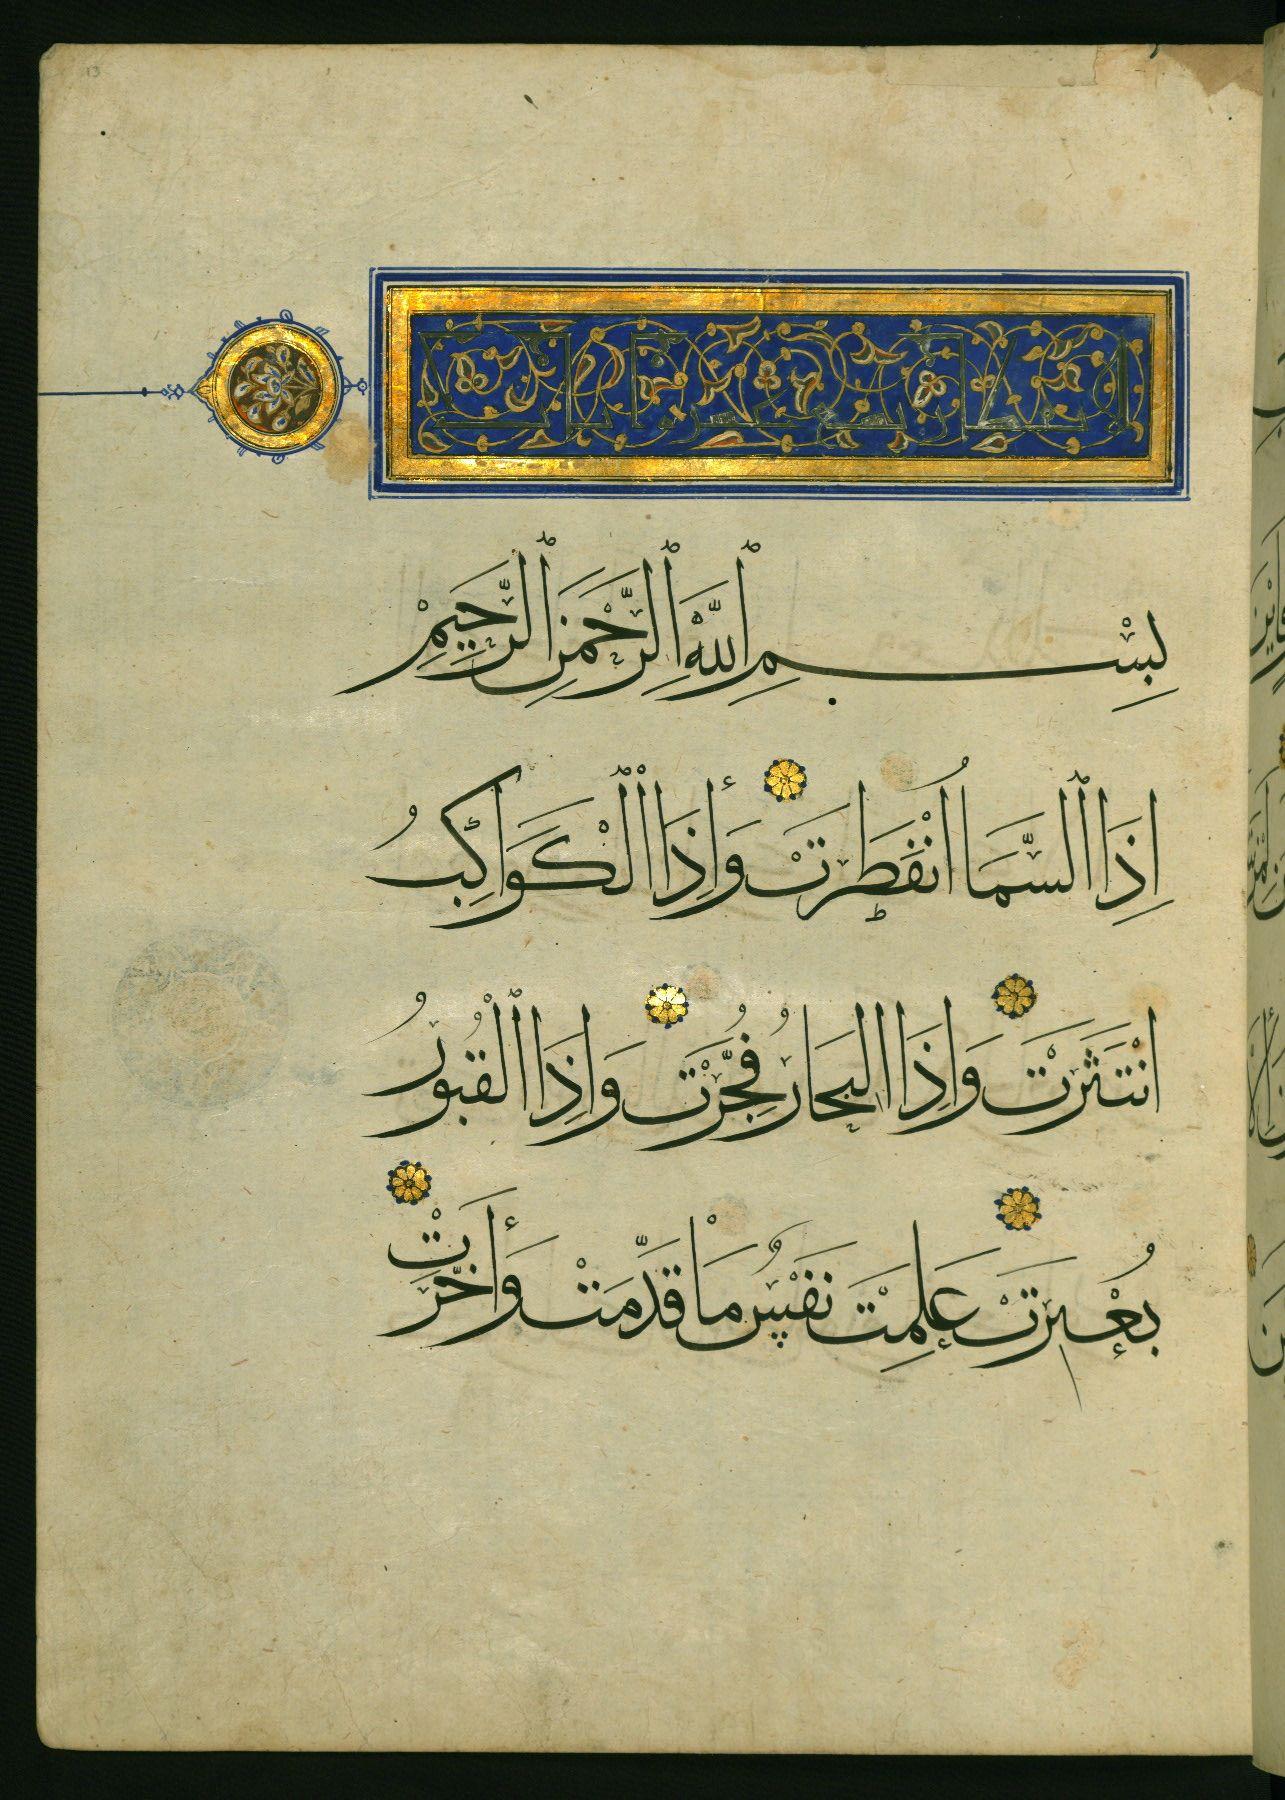 Illuminated Manuscript Koran Walters Art Museum Ms W 562 Fol 13a Por Walters Art Museum Illuminated Manuscripts Http Www Flickr Com P Bucher Arabisch